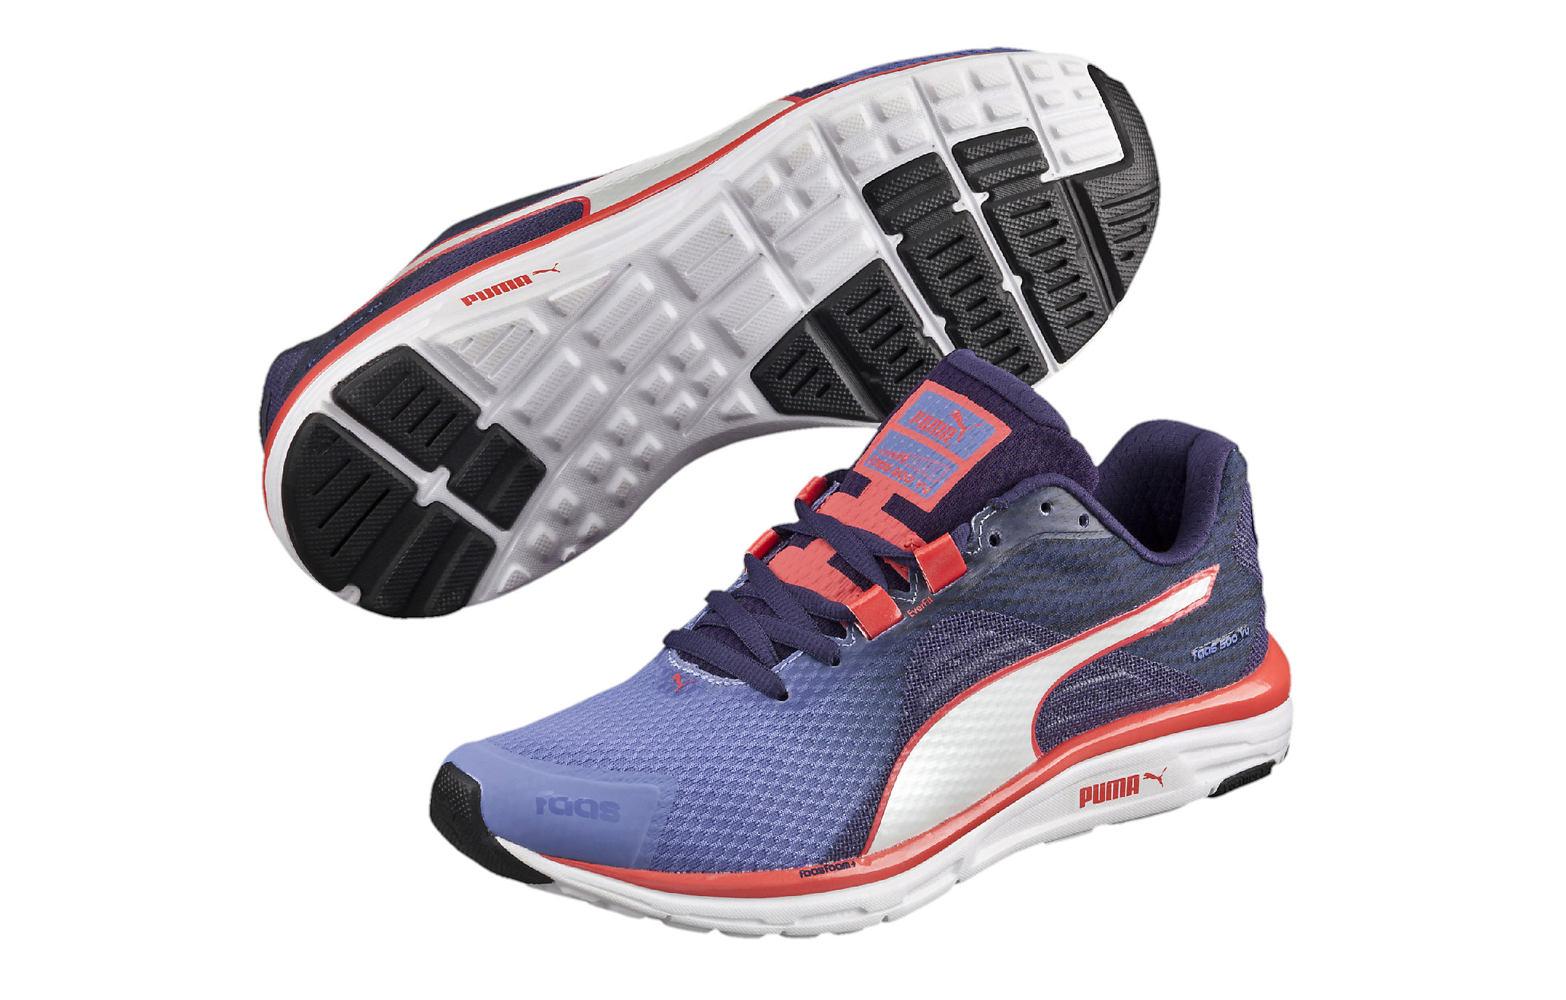 puma comfort shoes, Puma faas 500 v4 women's running shoes